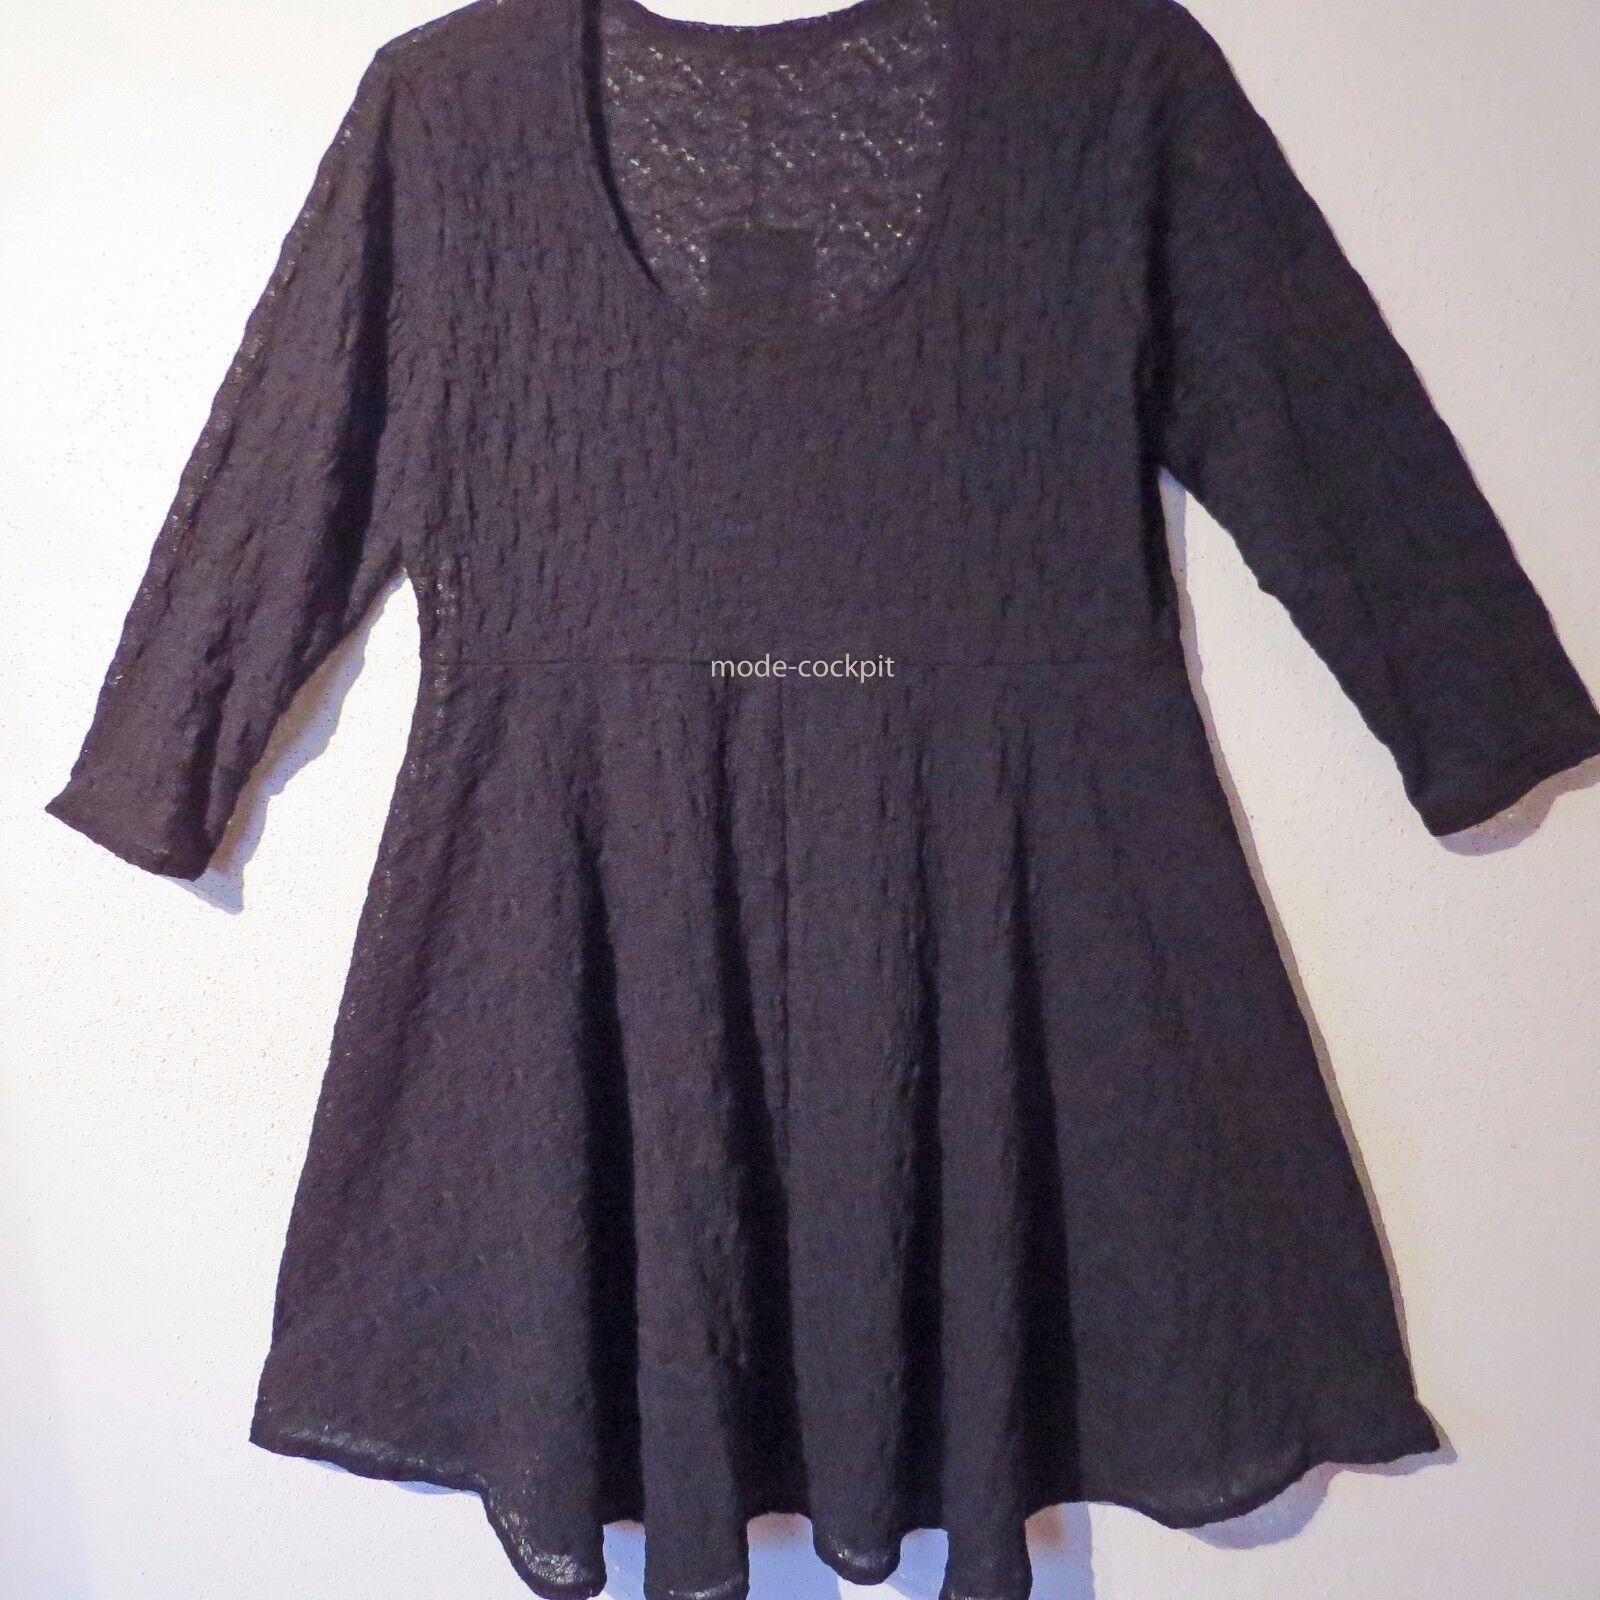 BORIS süße Tunika Long Shirt Lagenlook Stretch Spitze schwarz 46-48 (2)